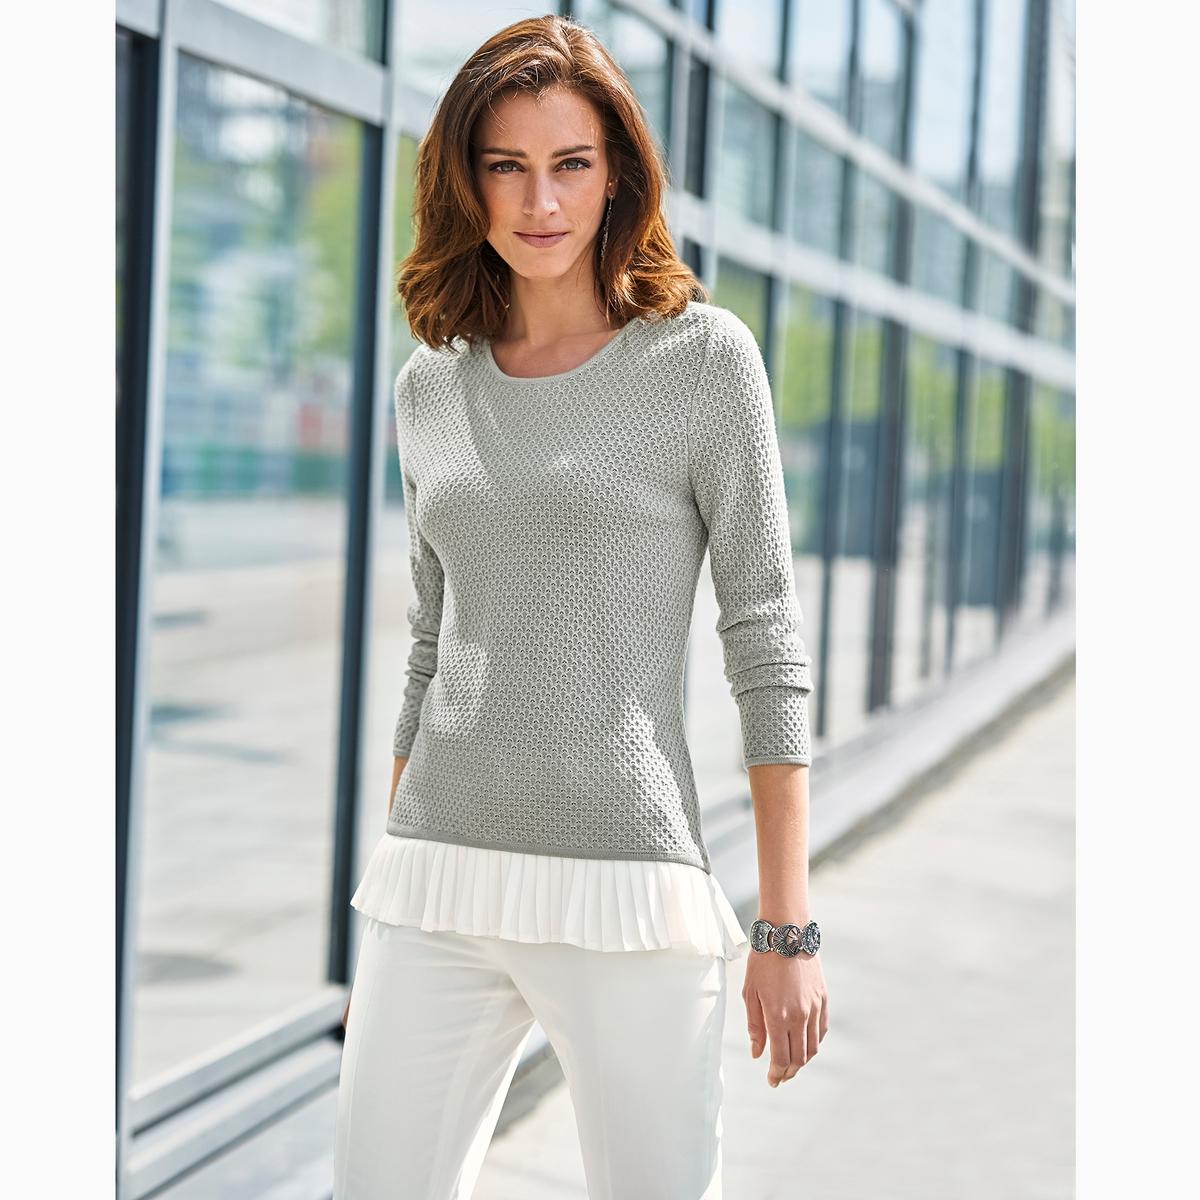 Пуловер из оригинального трикотажа, 10% шерсти пуловер с капюшоном из оригинального трикотажа